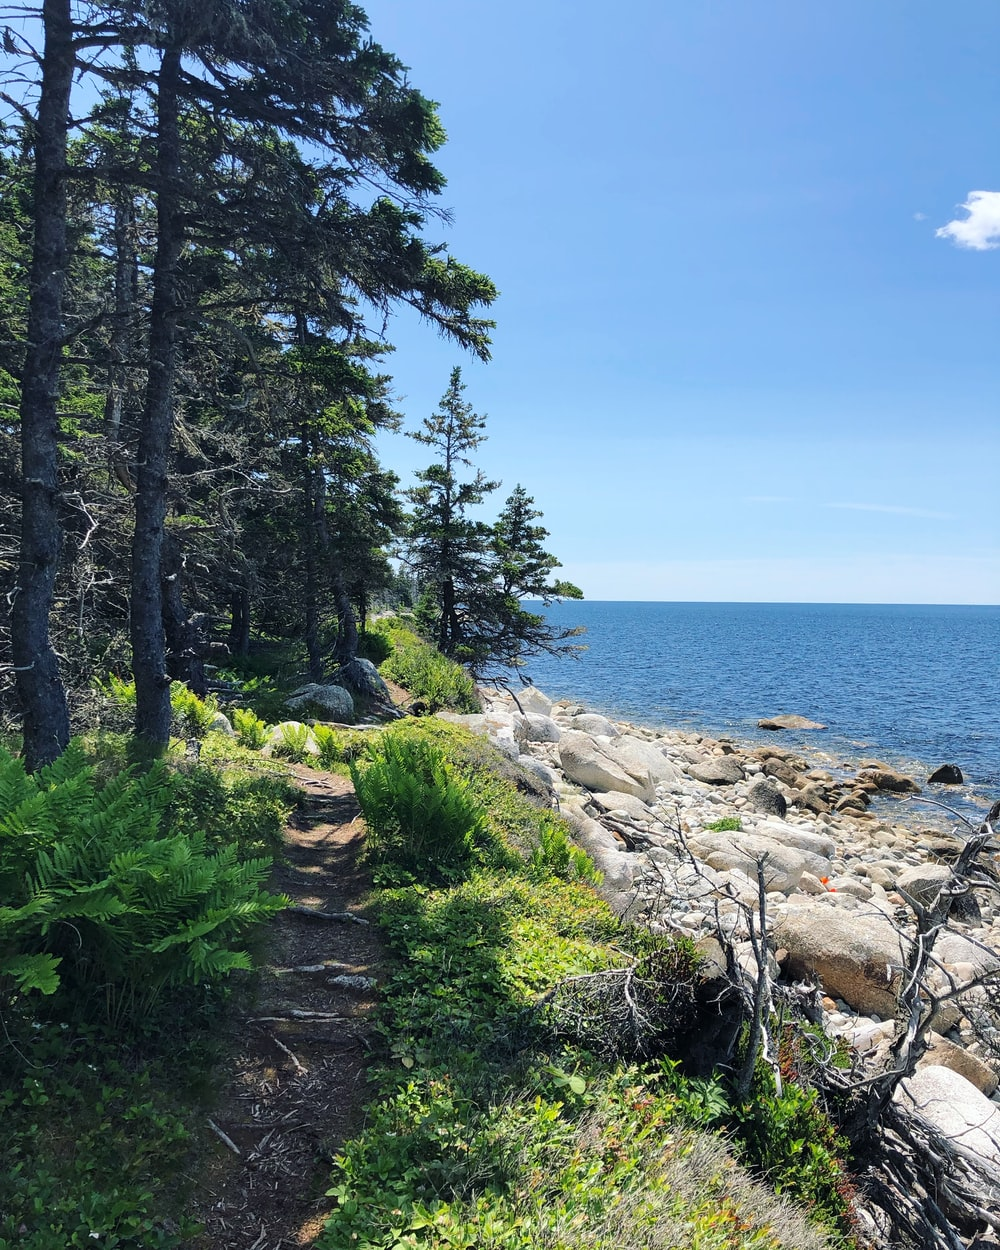 pine trees near seashore